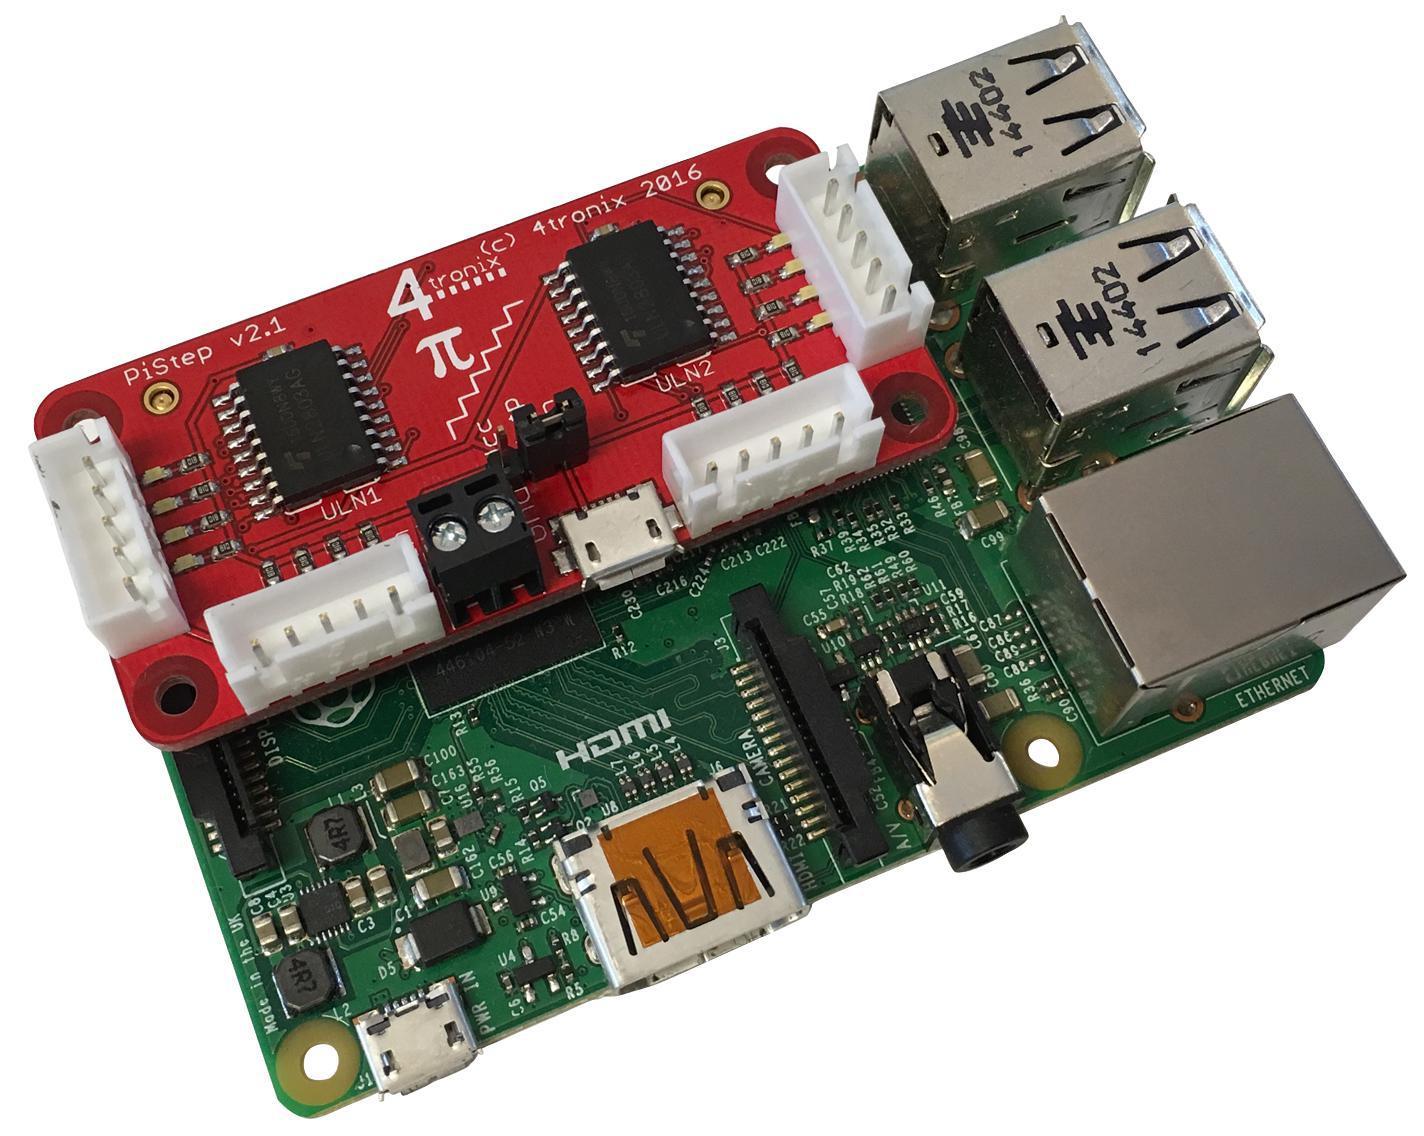 4tronix pistep2q quad stepper motor control board ebay